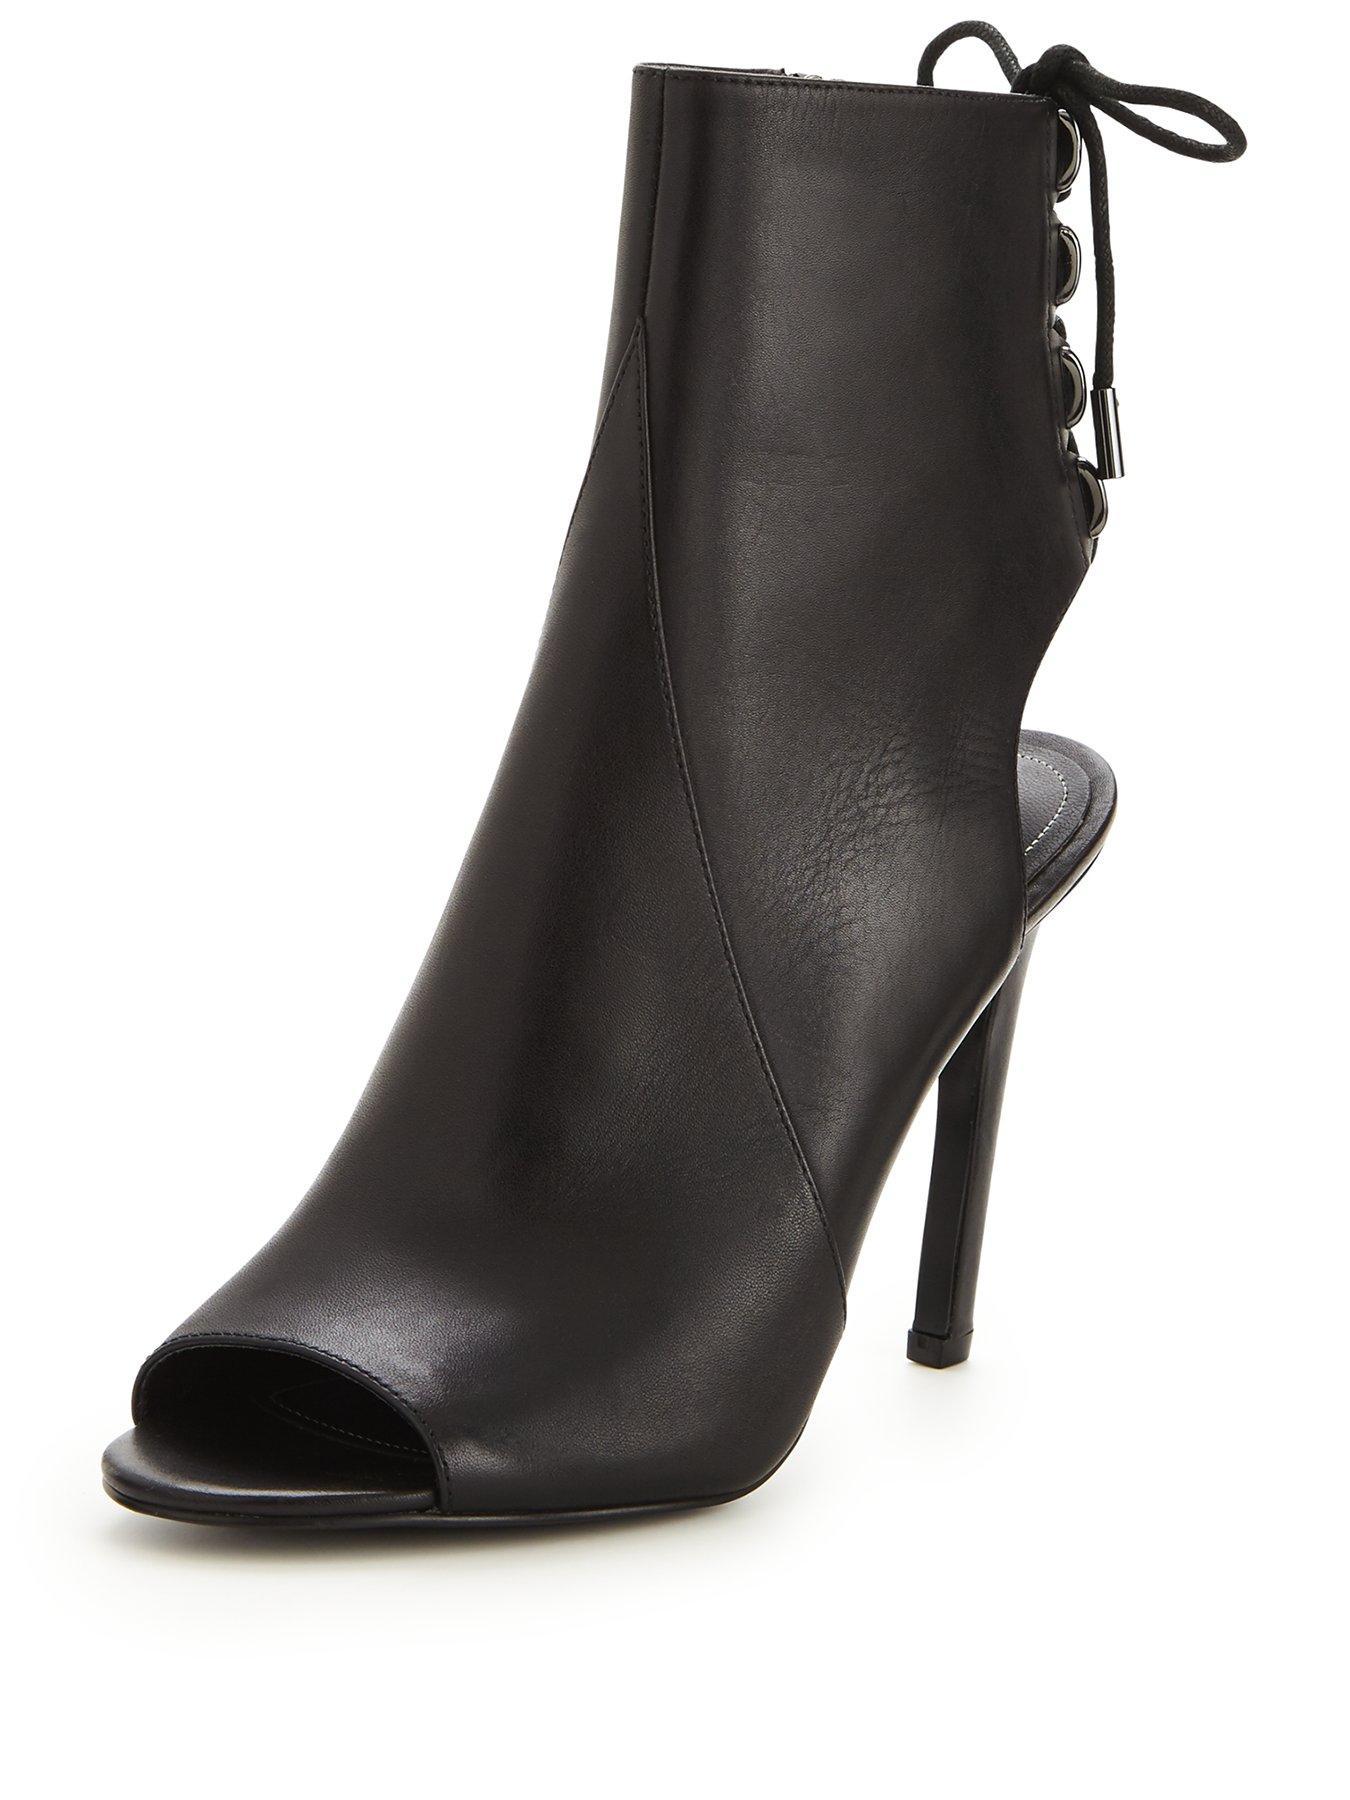 Discount Kendall & Kylie Medow Stiletto Black Shoe Boots for Women Online Sale